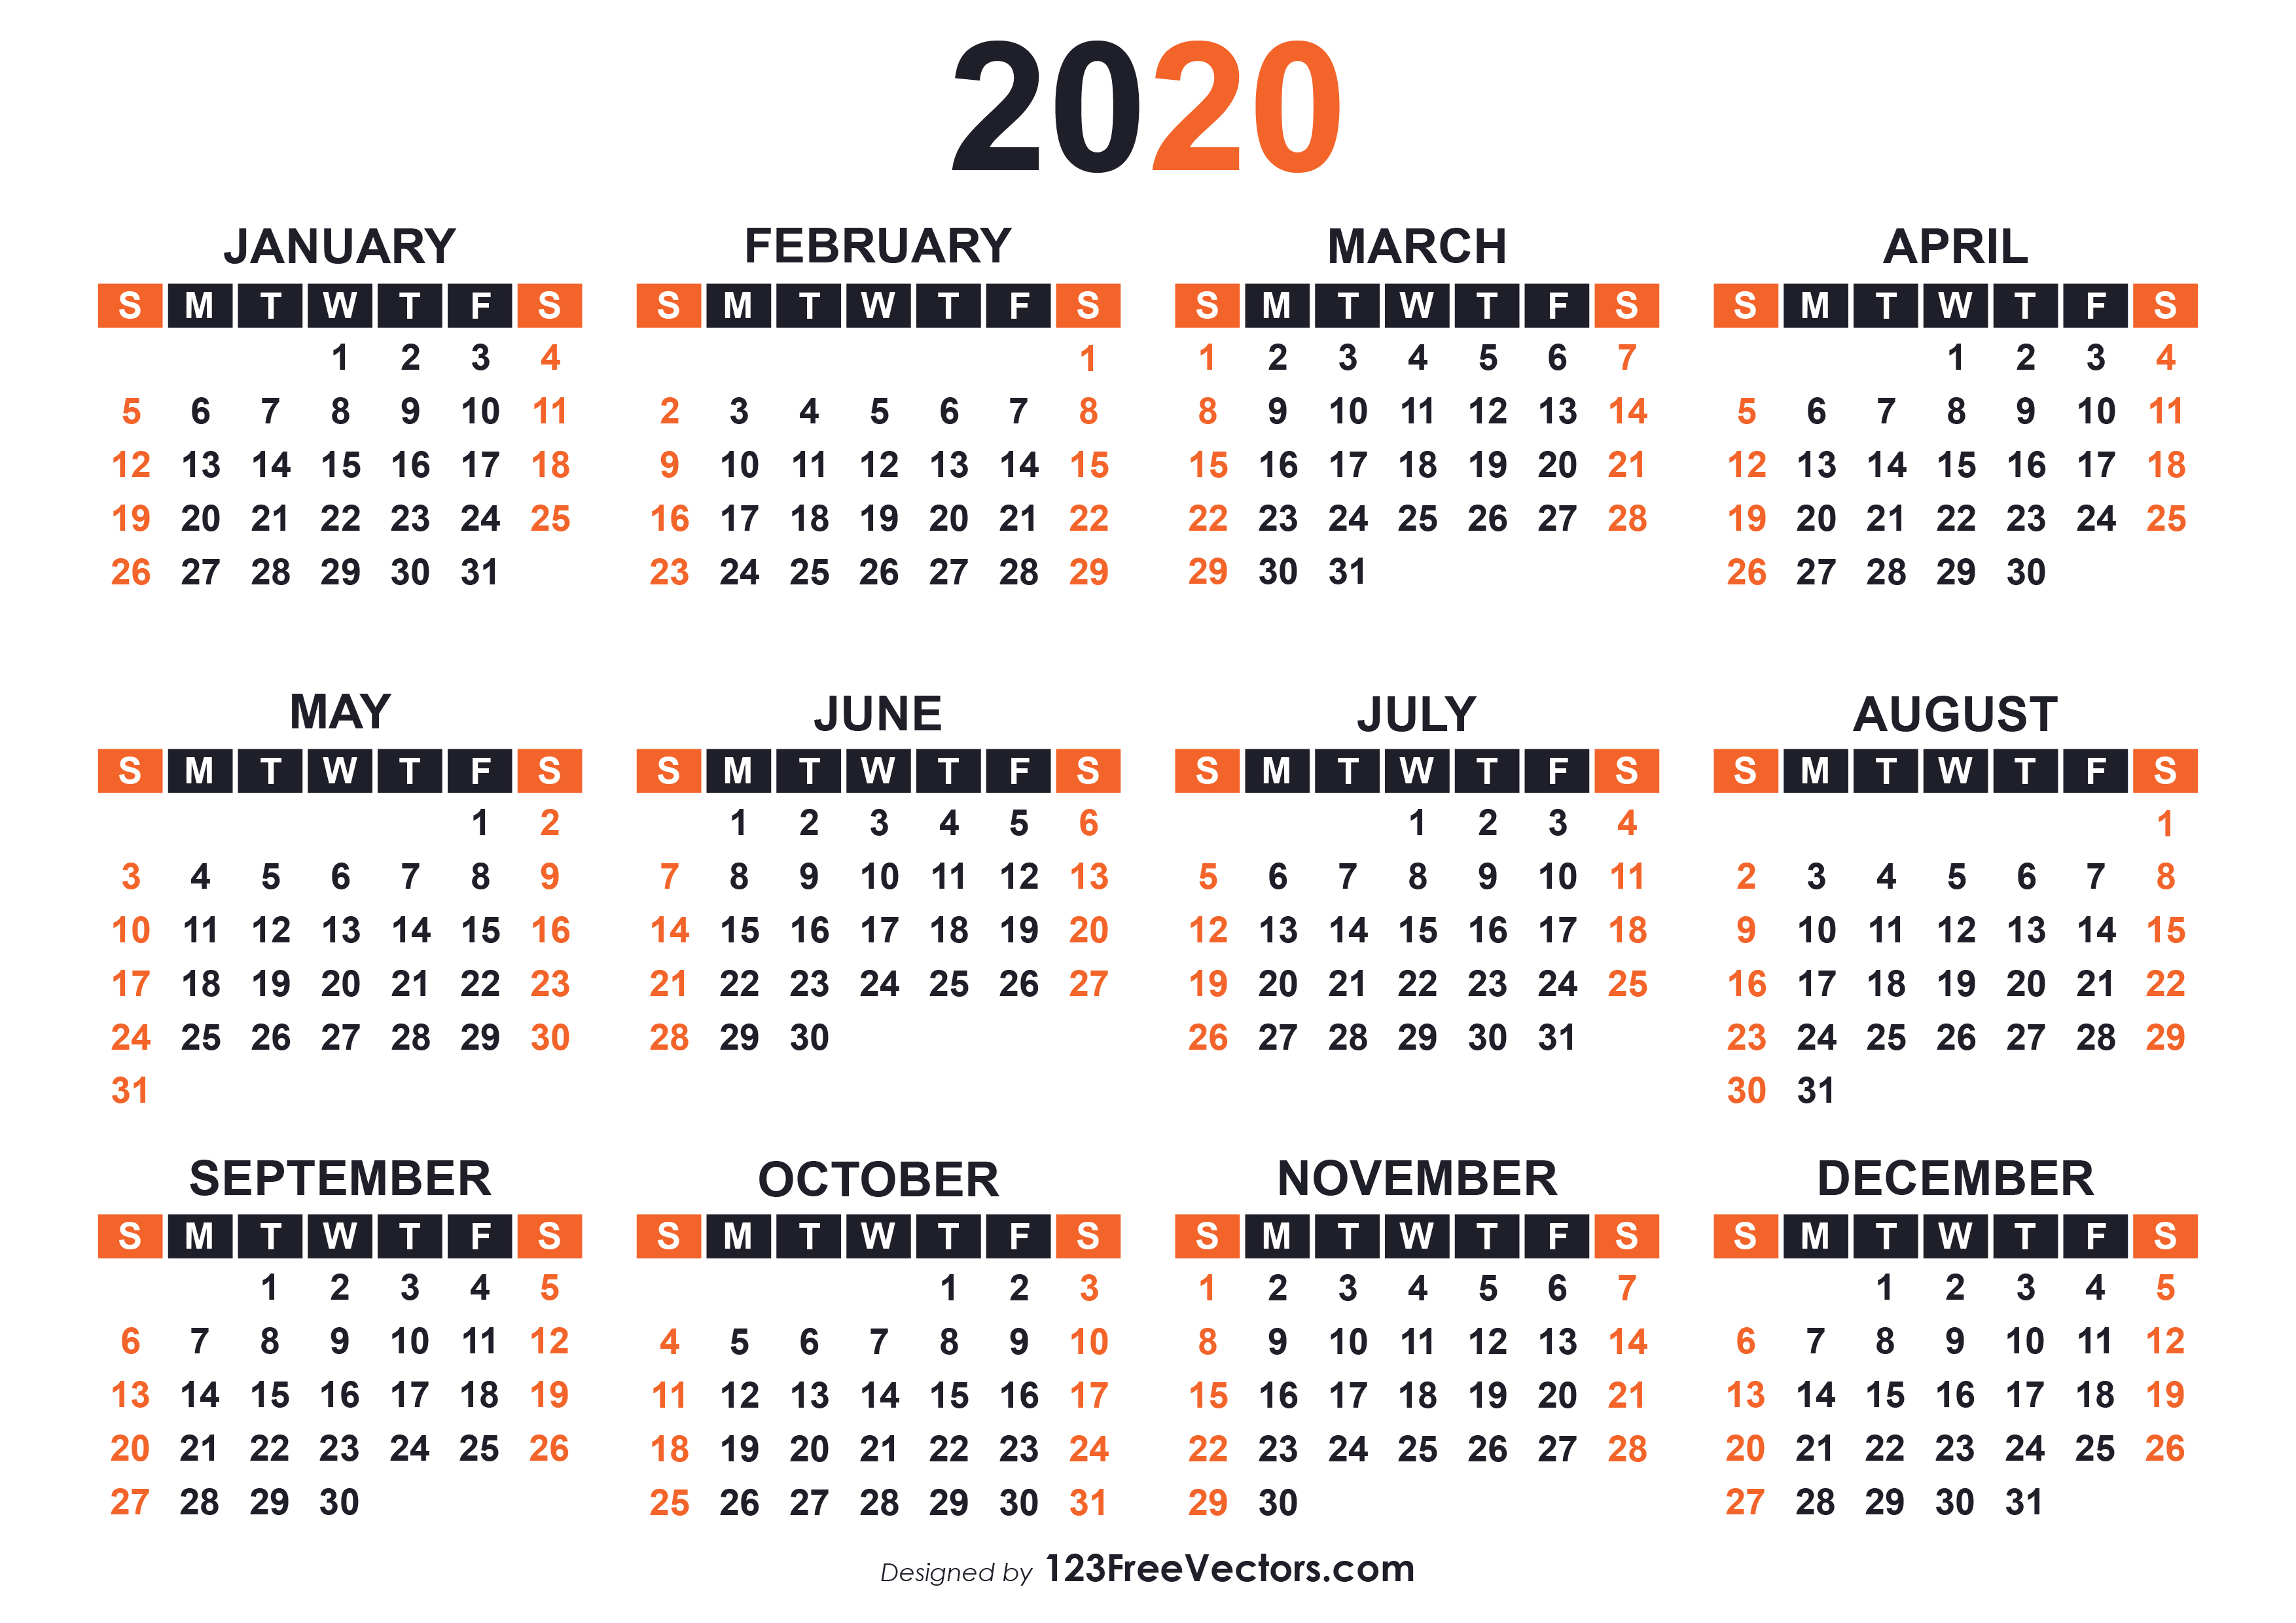 2020 Free Printable Calendar Templates in Printable Calander 2020